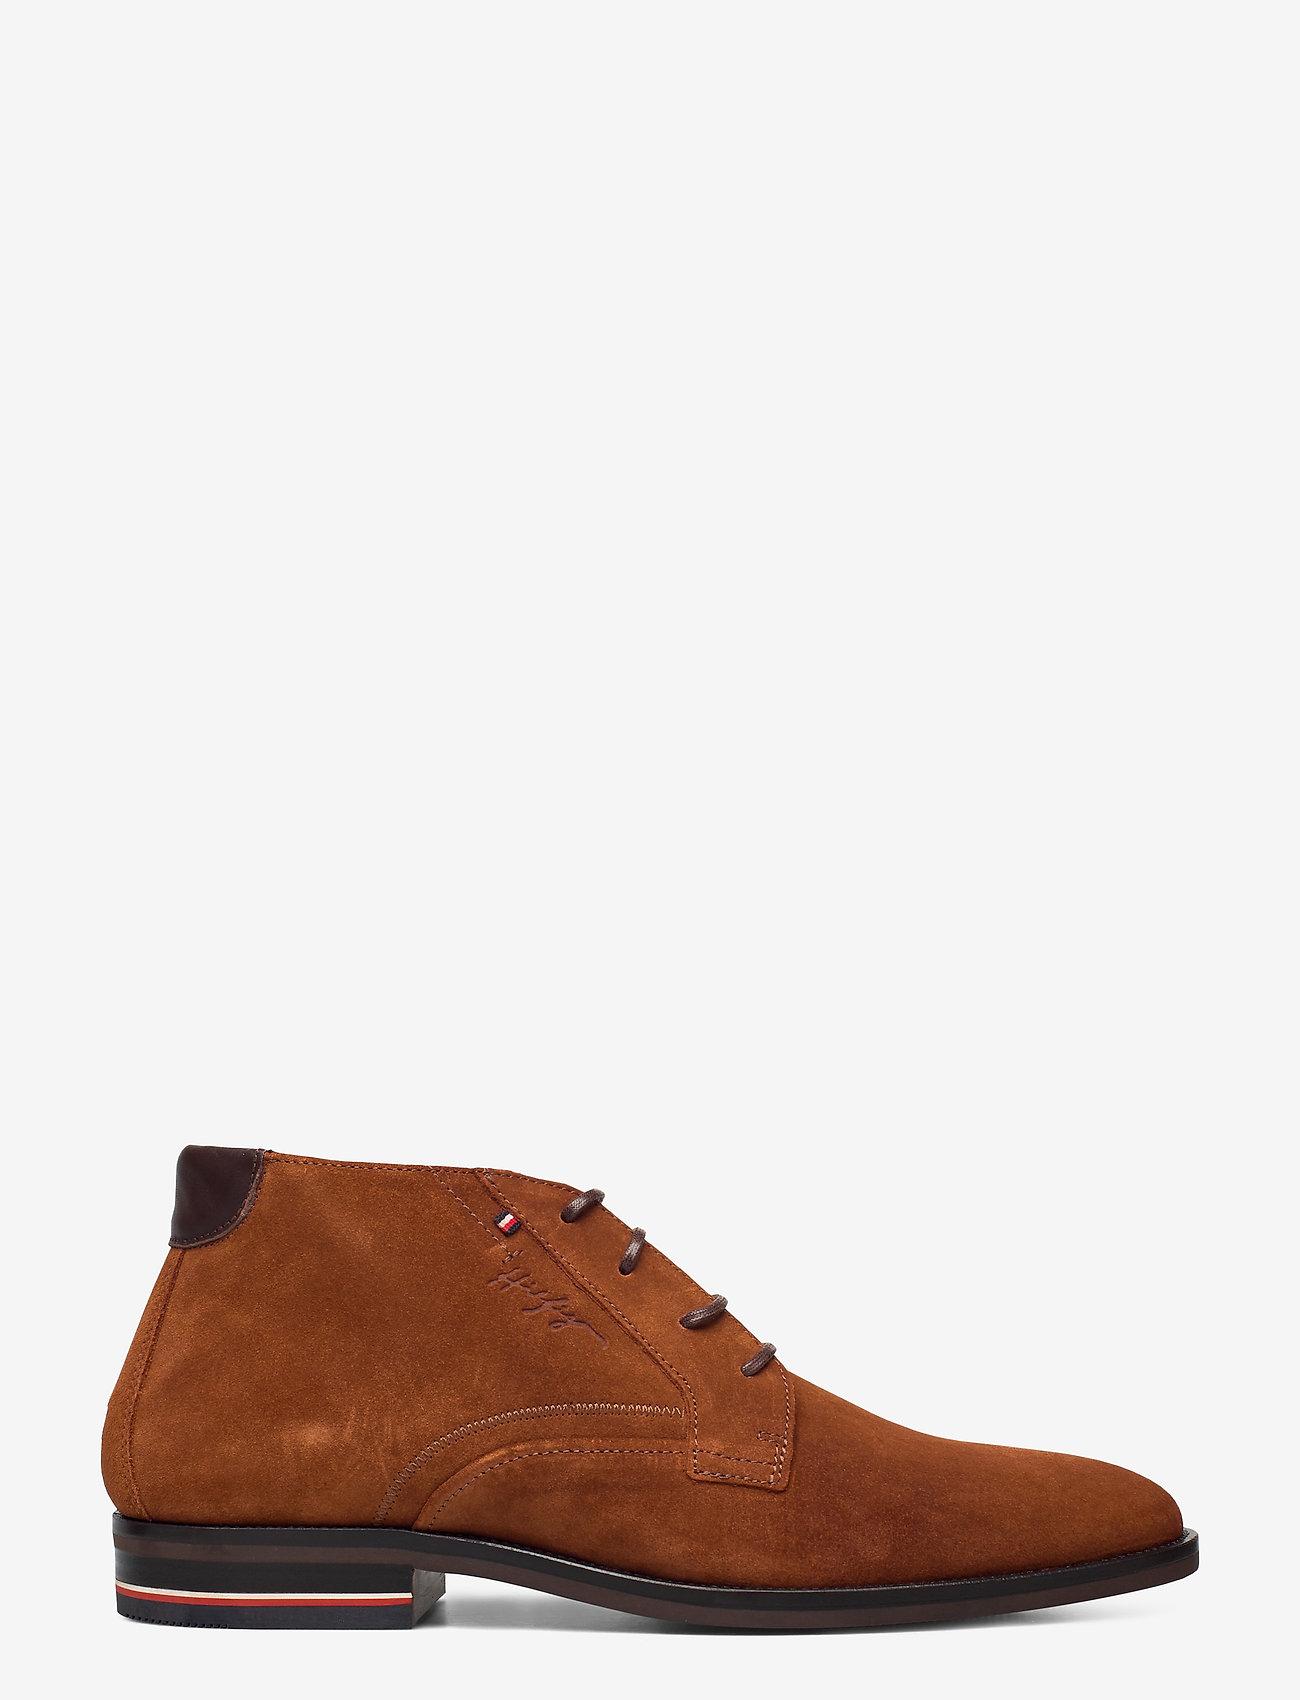 Tommy Hilfiger - SIGNATURE HILFIGER SUEDE BOOT - desert boots - winter cognac - 1